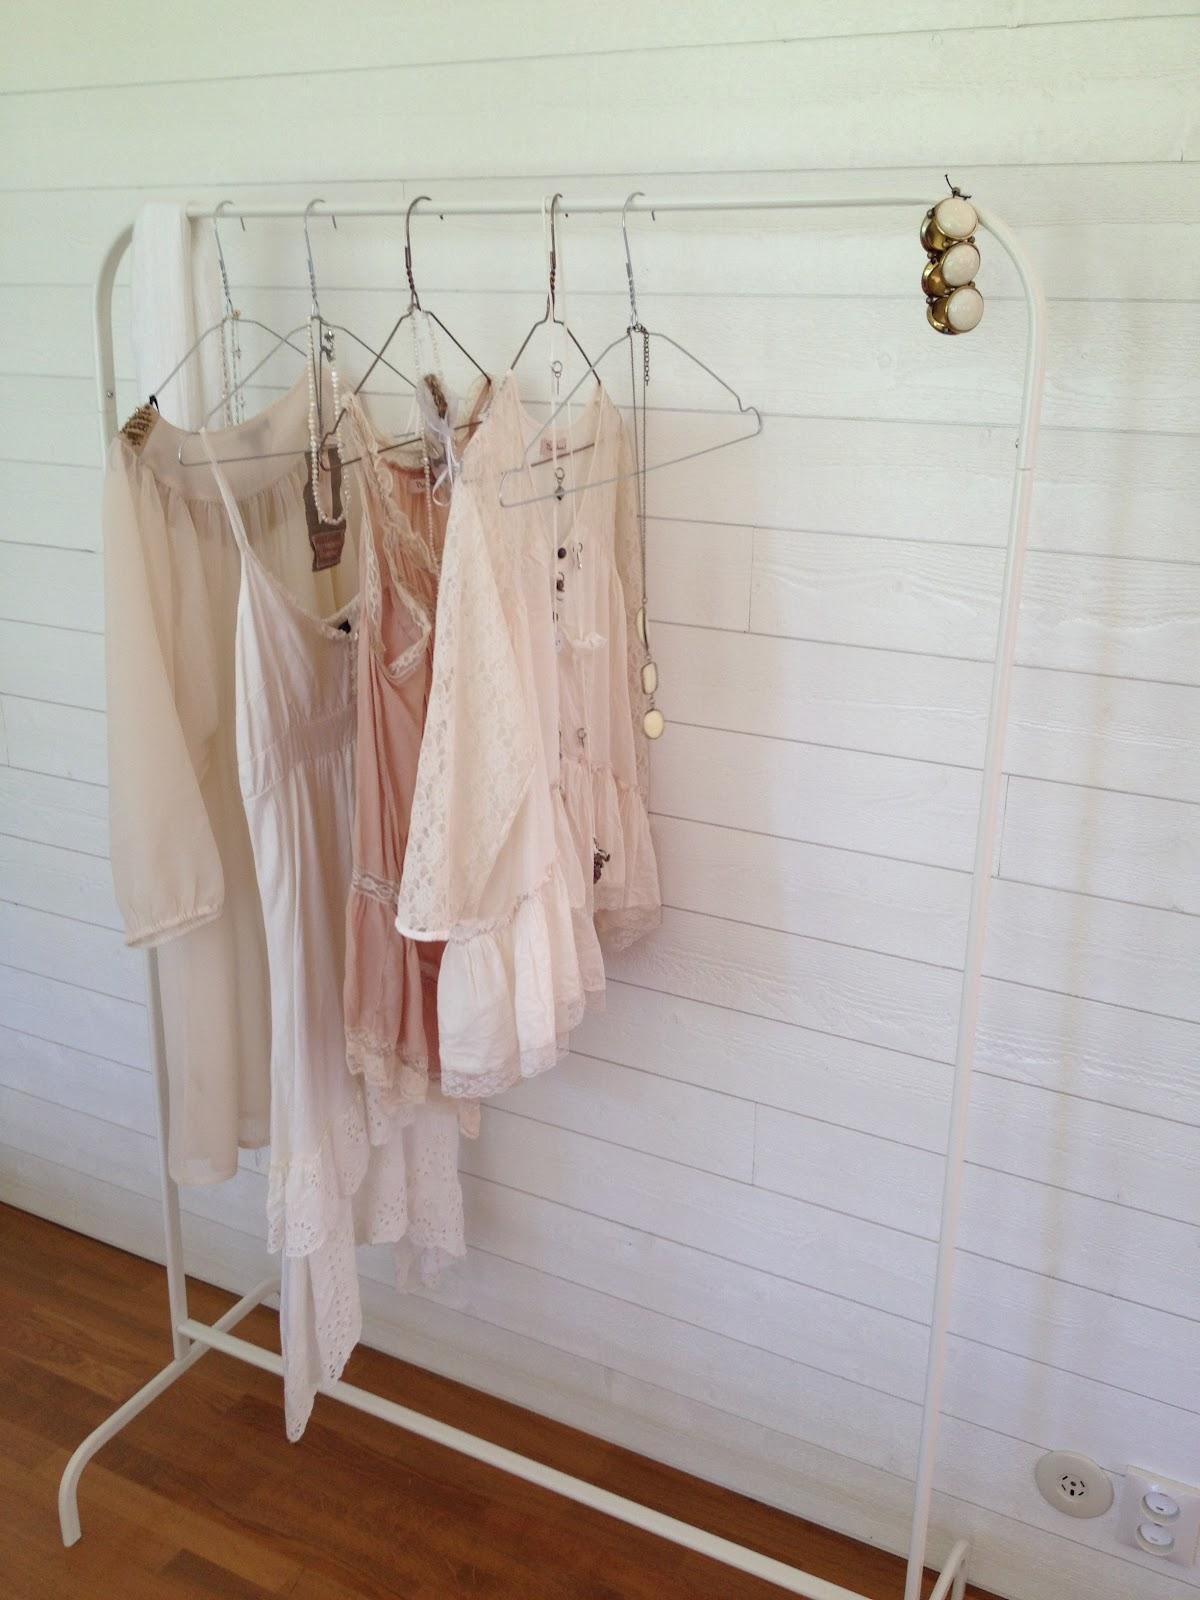 Carolinas little blogg Klädhängare& Vintage